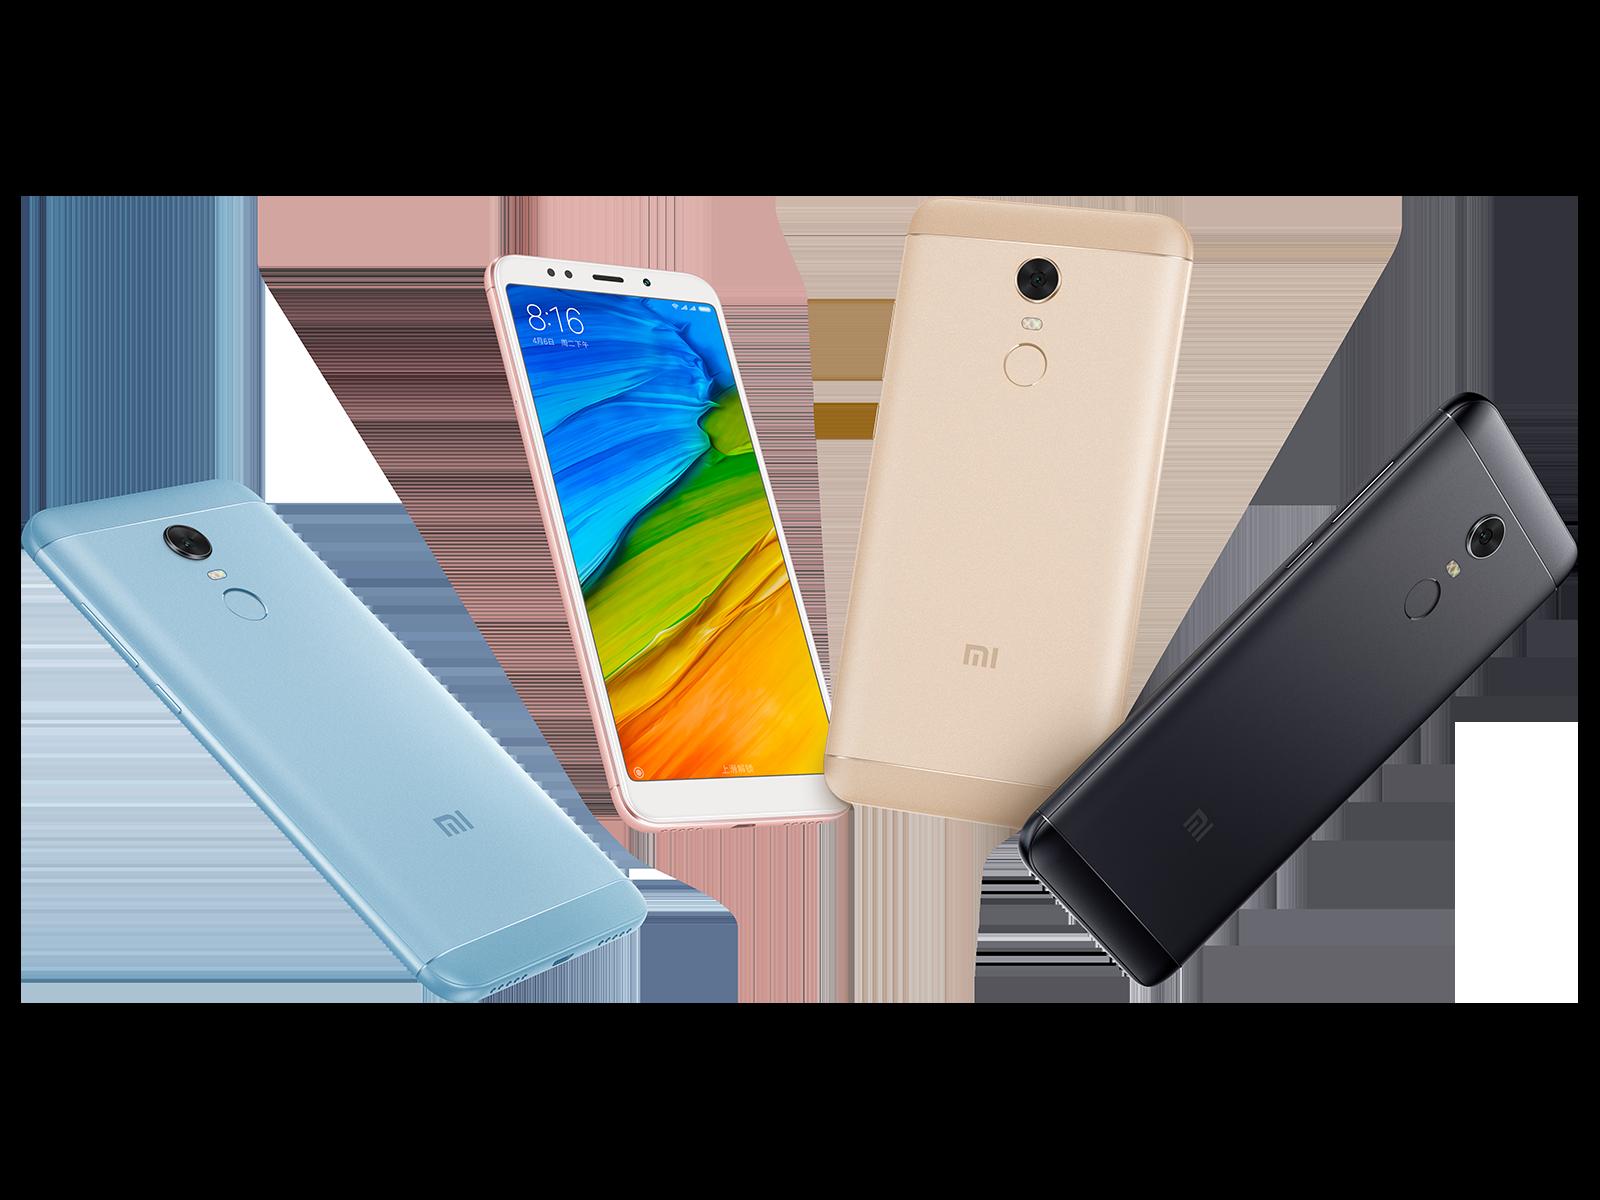 Xiaomi Redmi 5 Plus Smartphone Review Reviews 3gb 32gb Black Full Resolution